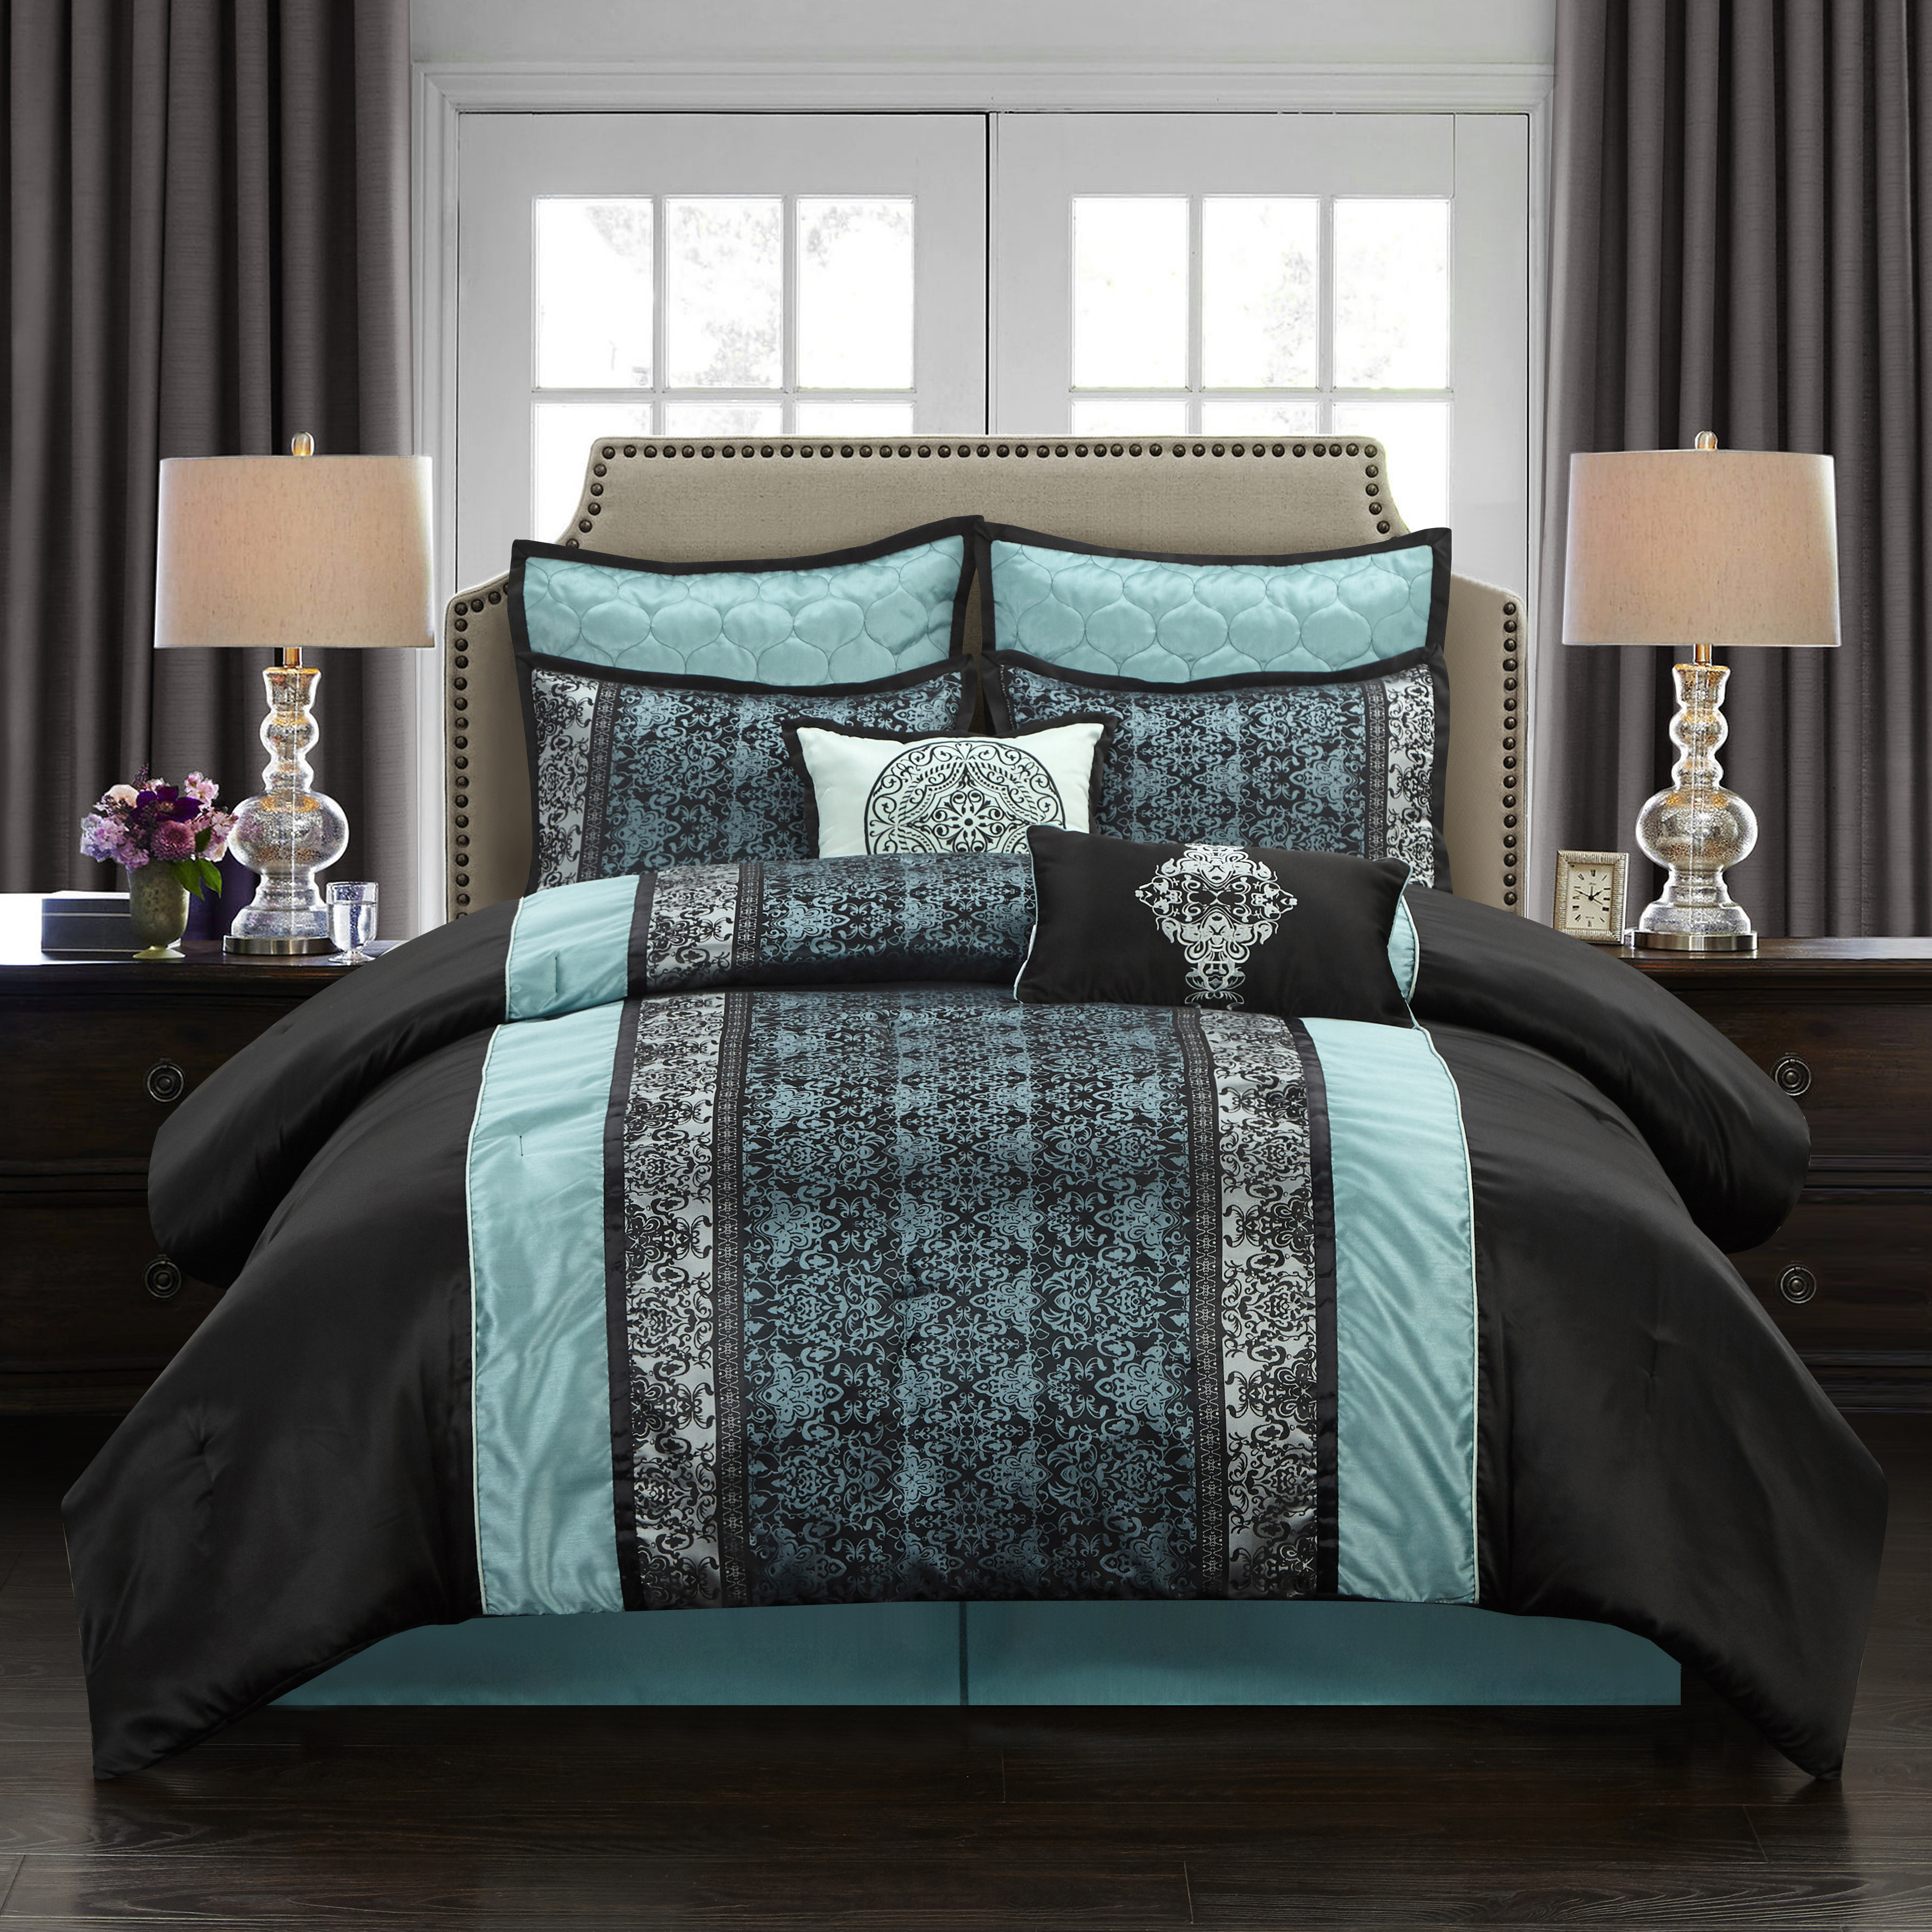 Stratford Park by Nanshing Arabesque 8-Piece Bedding Comforter Set by NANSHING AMERICA INC